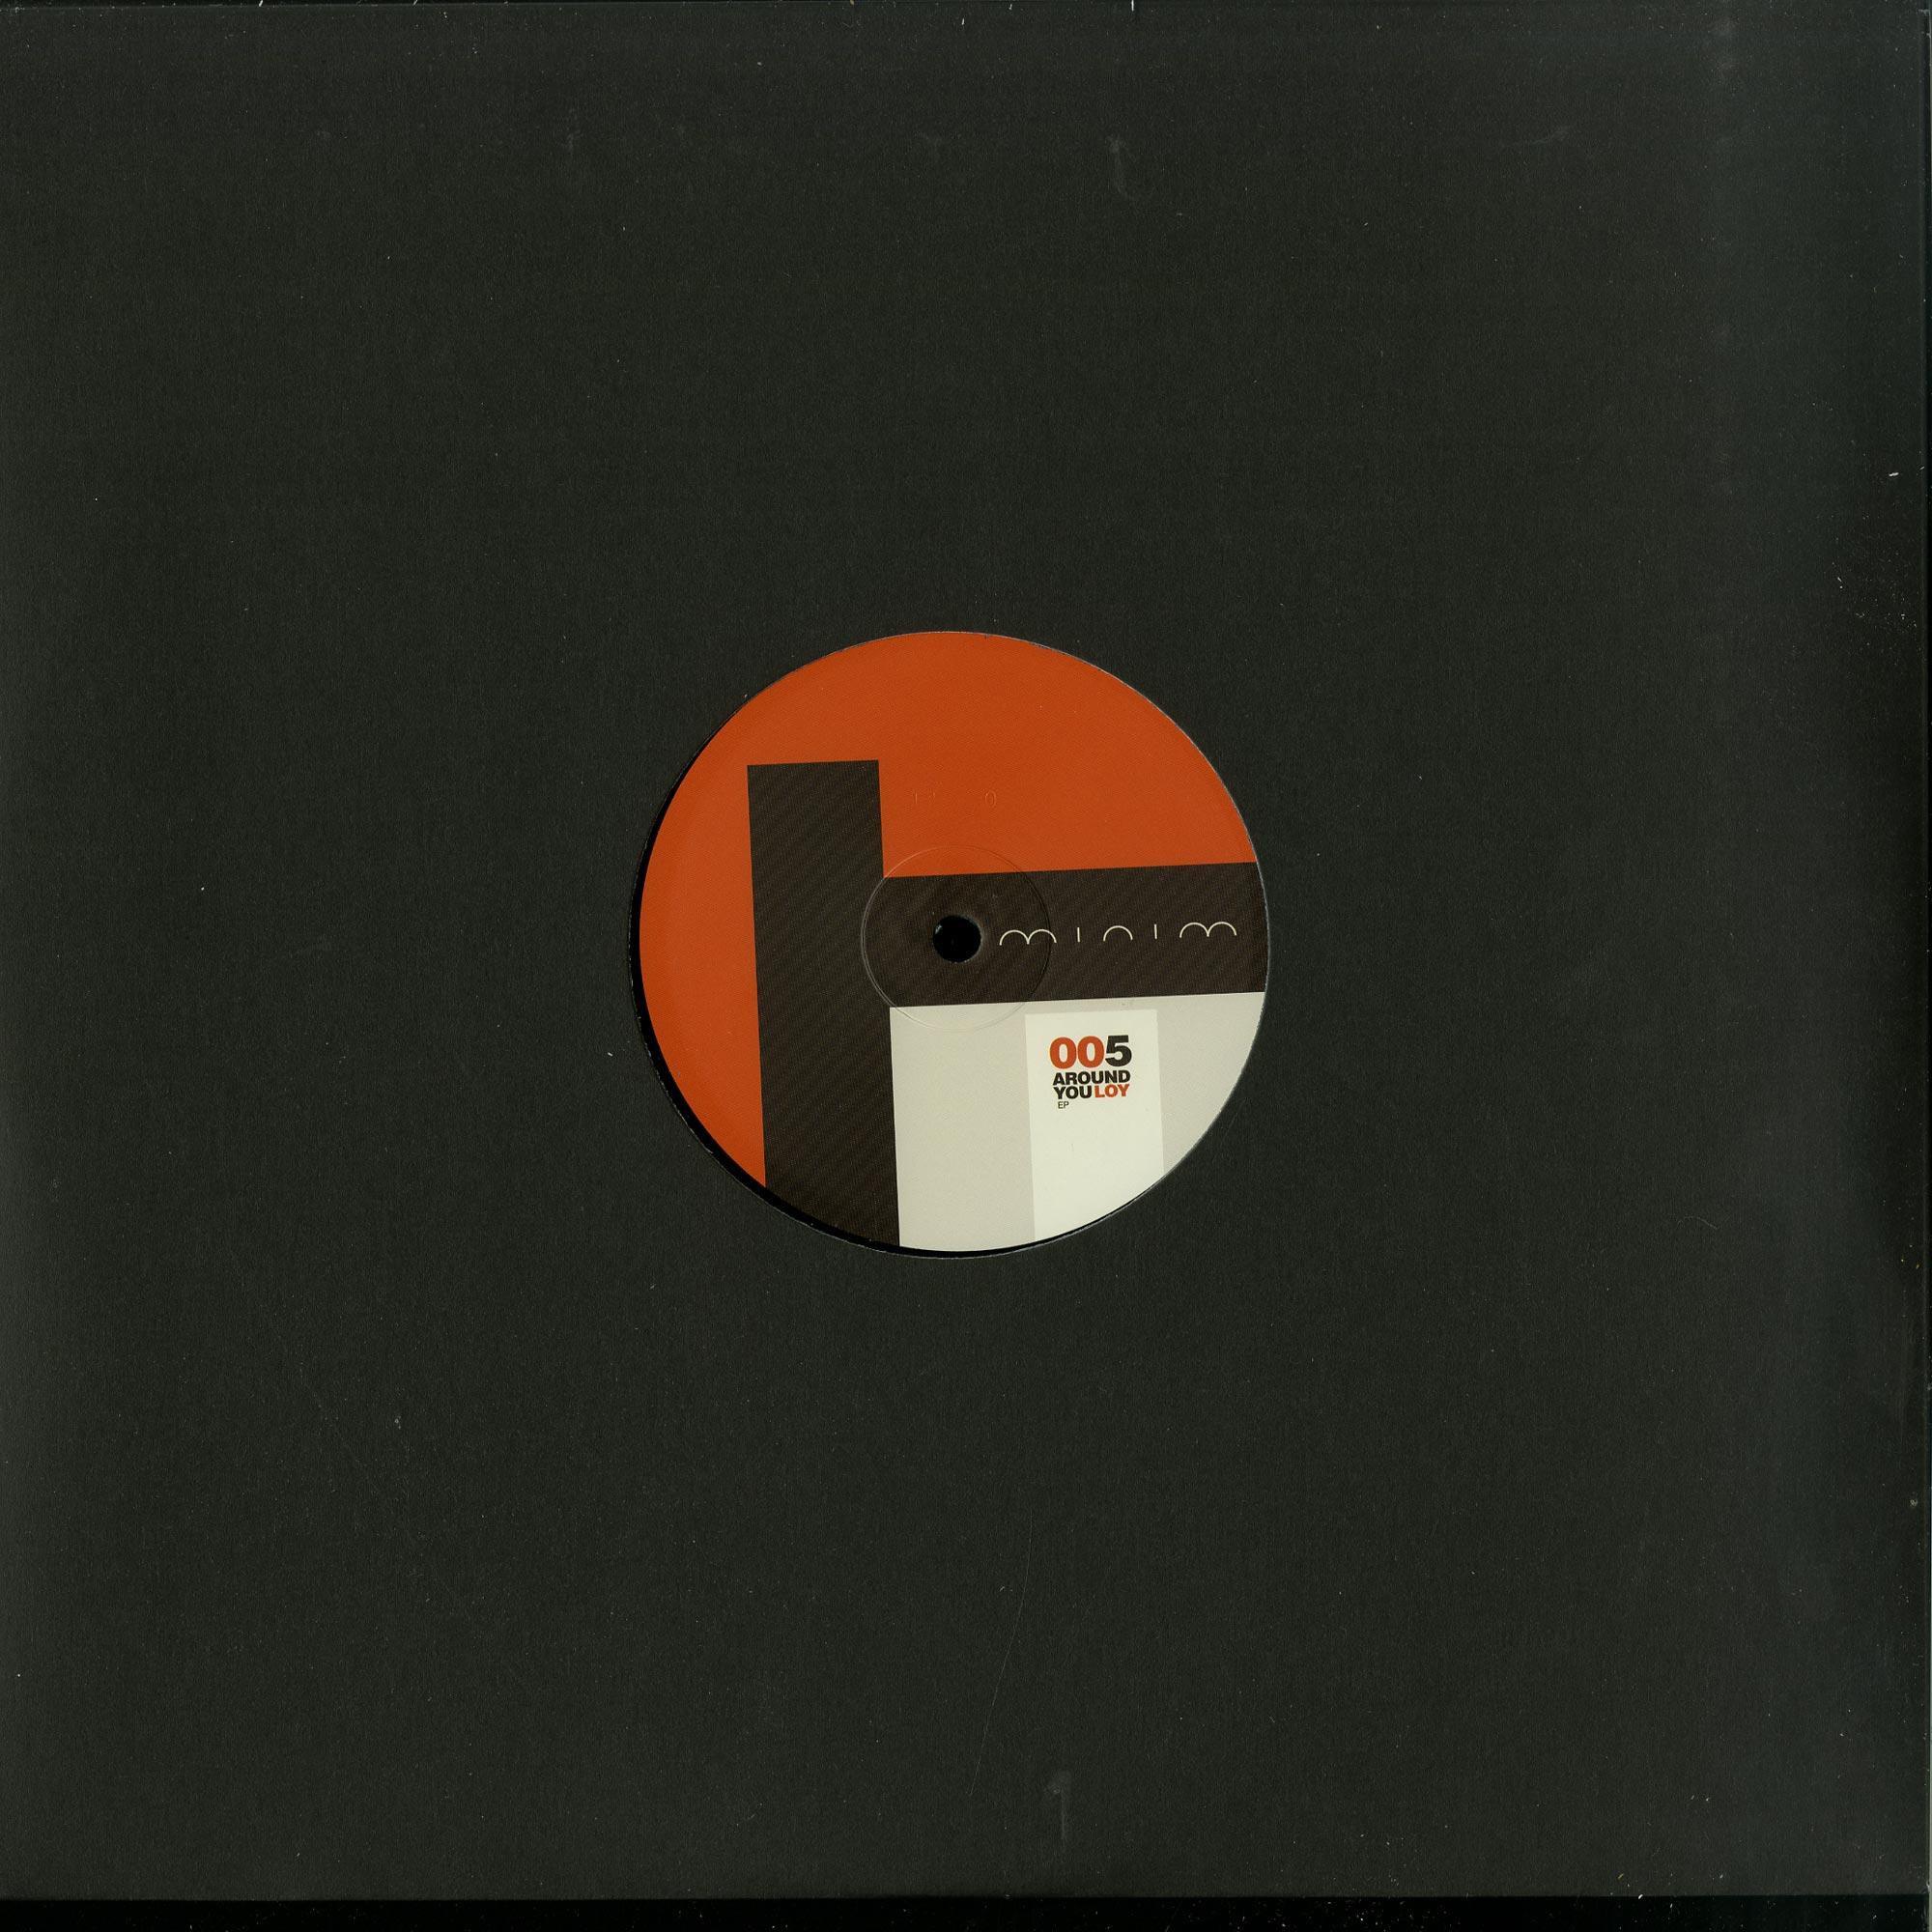 LOy - AROUND YOU EP